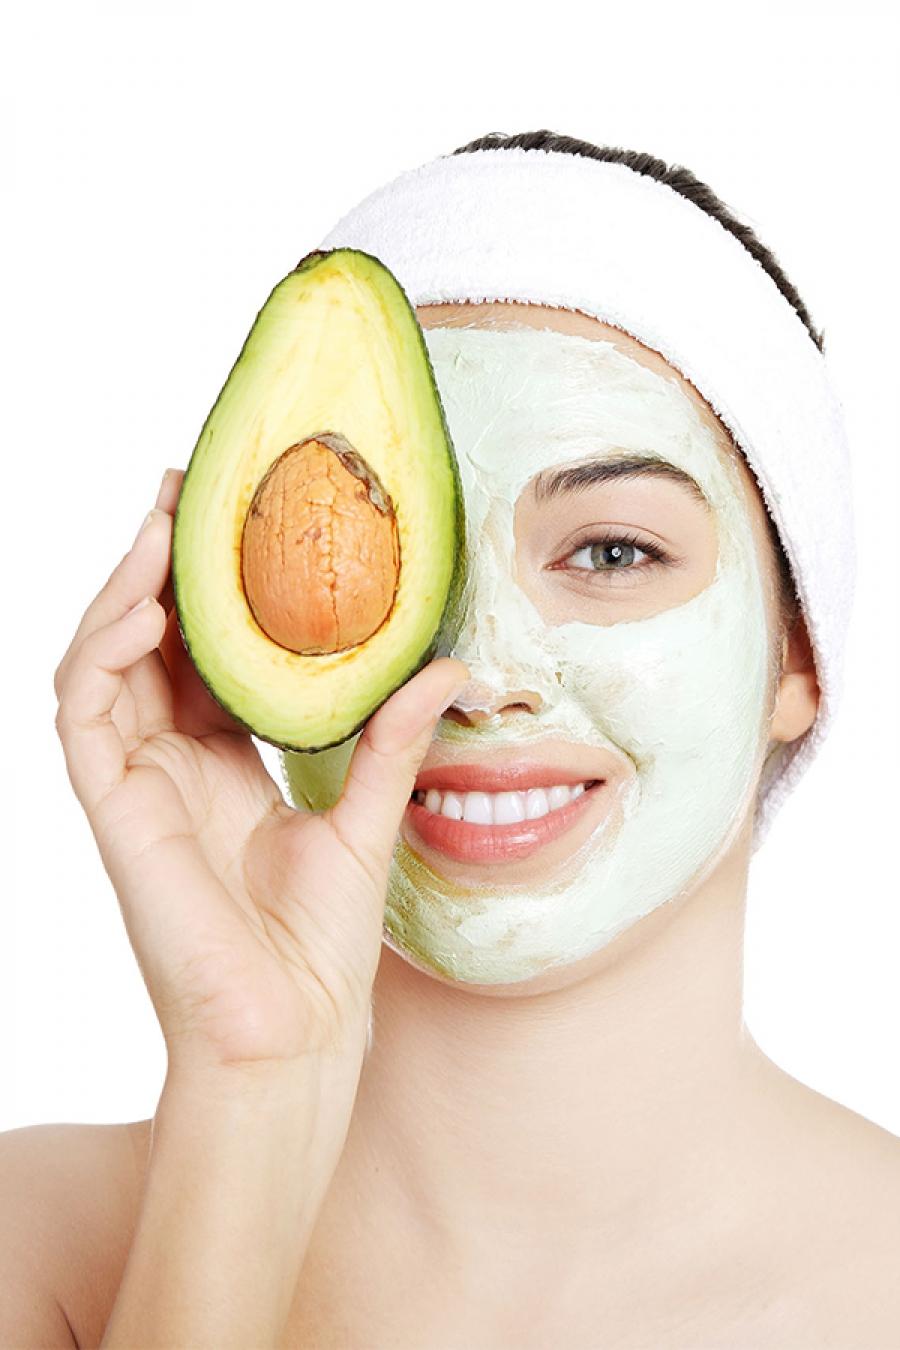 Facial masks for wrinkles